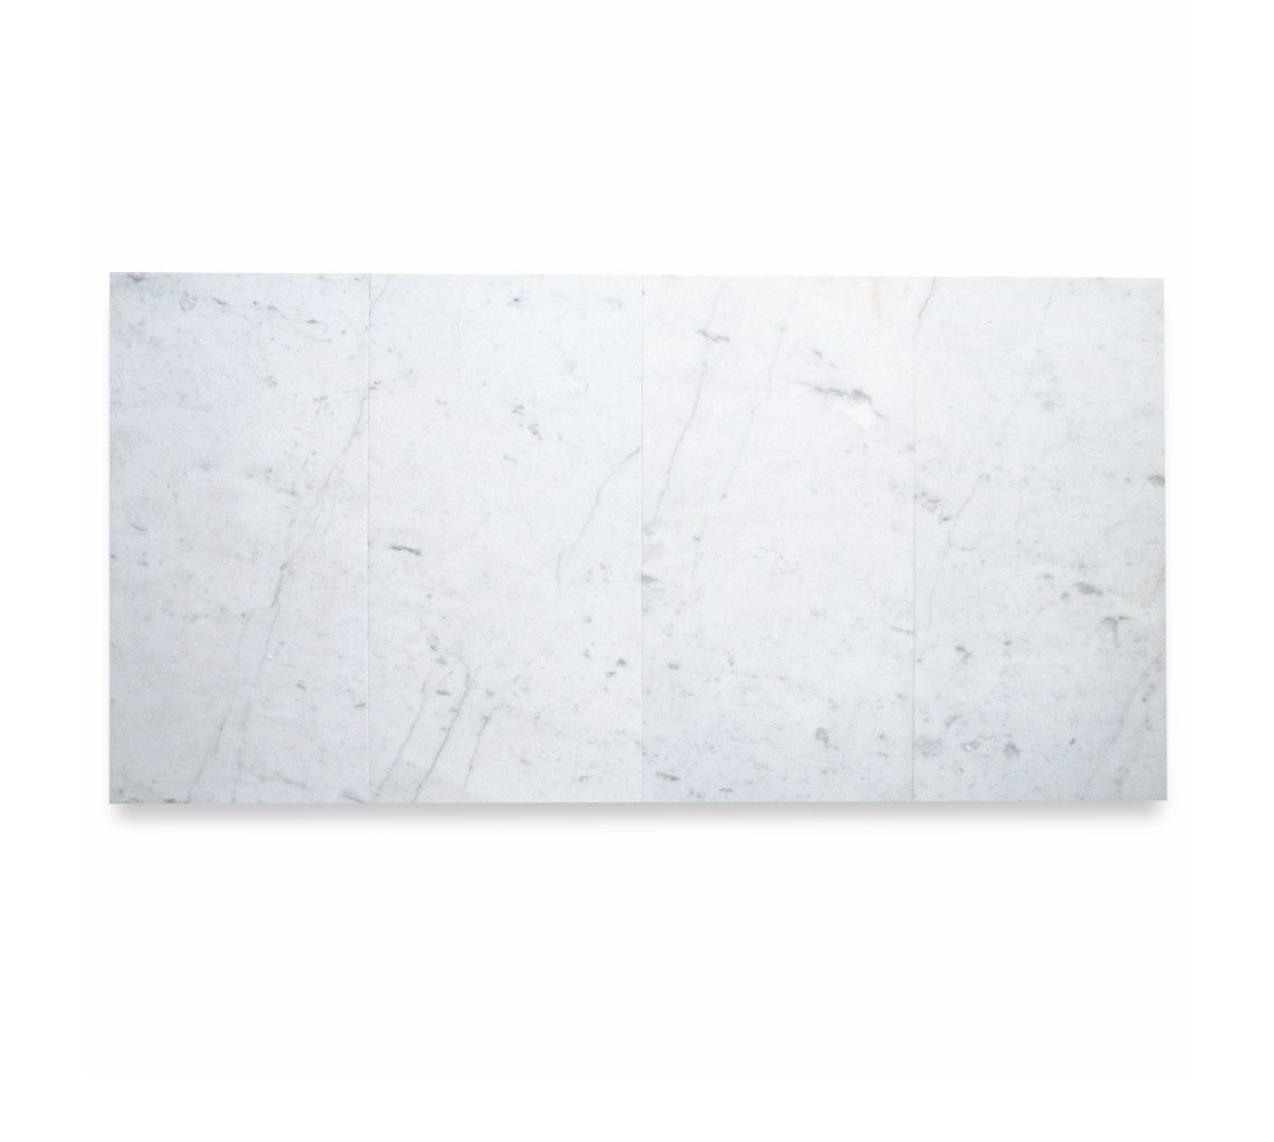 West Hampton Carrara White Marble Matte Honed Tile 12x24